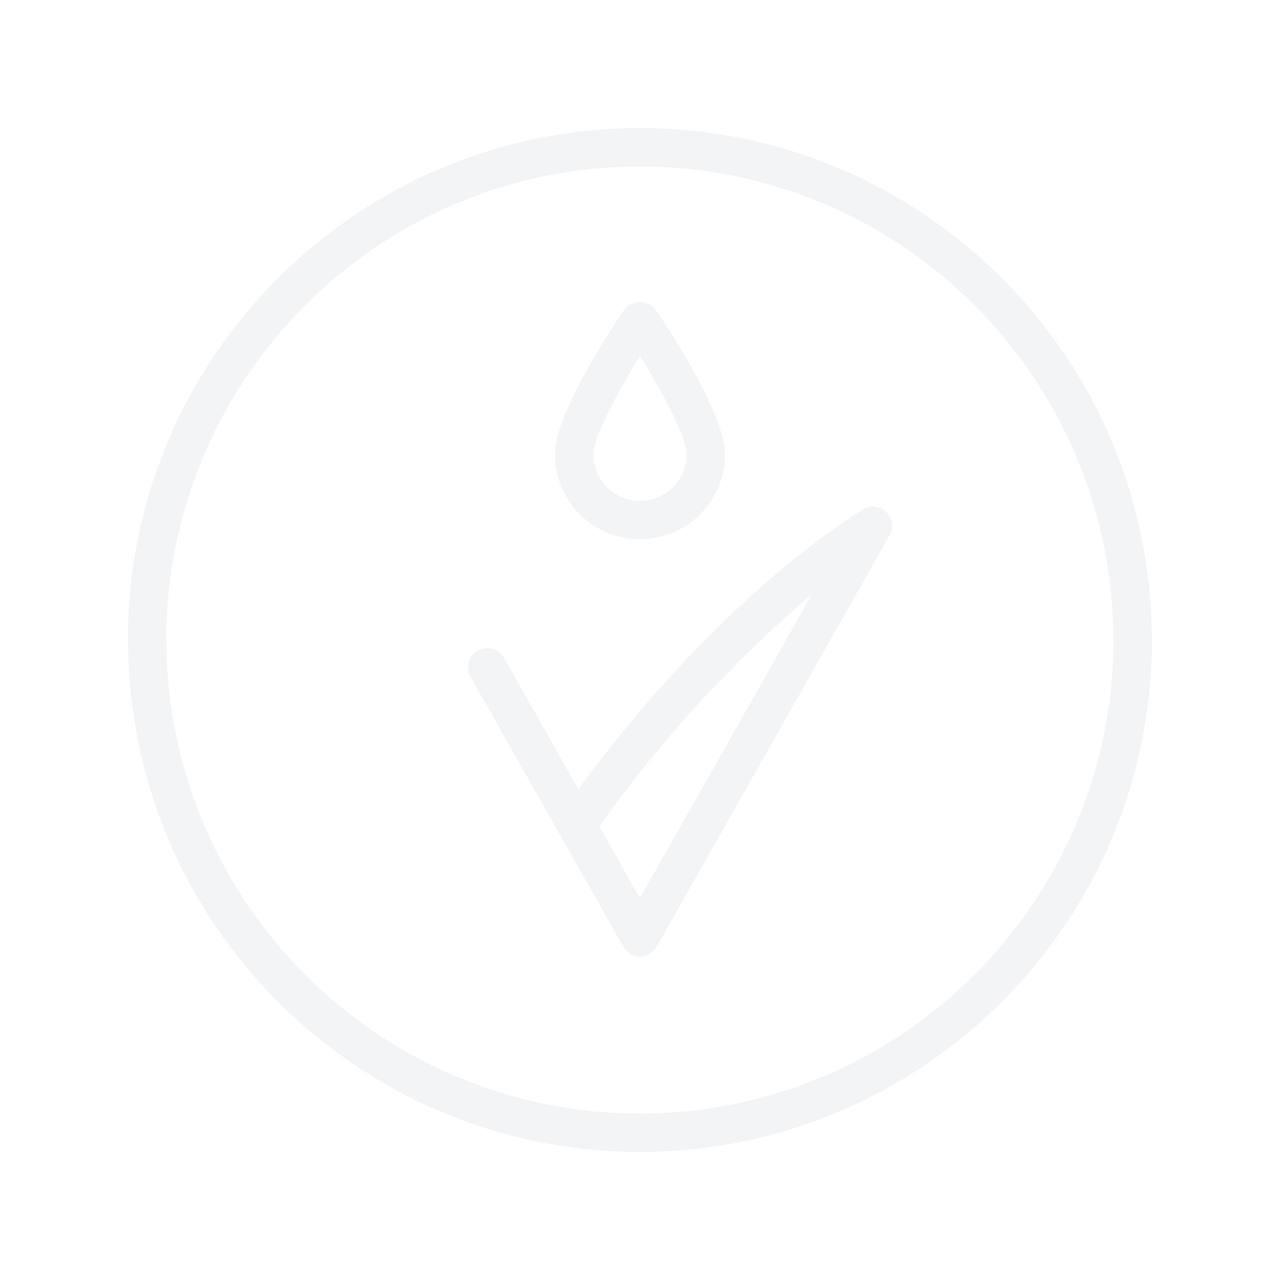 IDUN Minerals Eyebrow Pencil Ask 1.2g